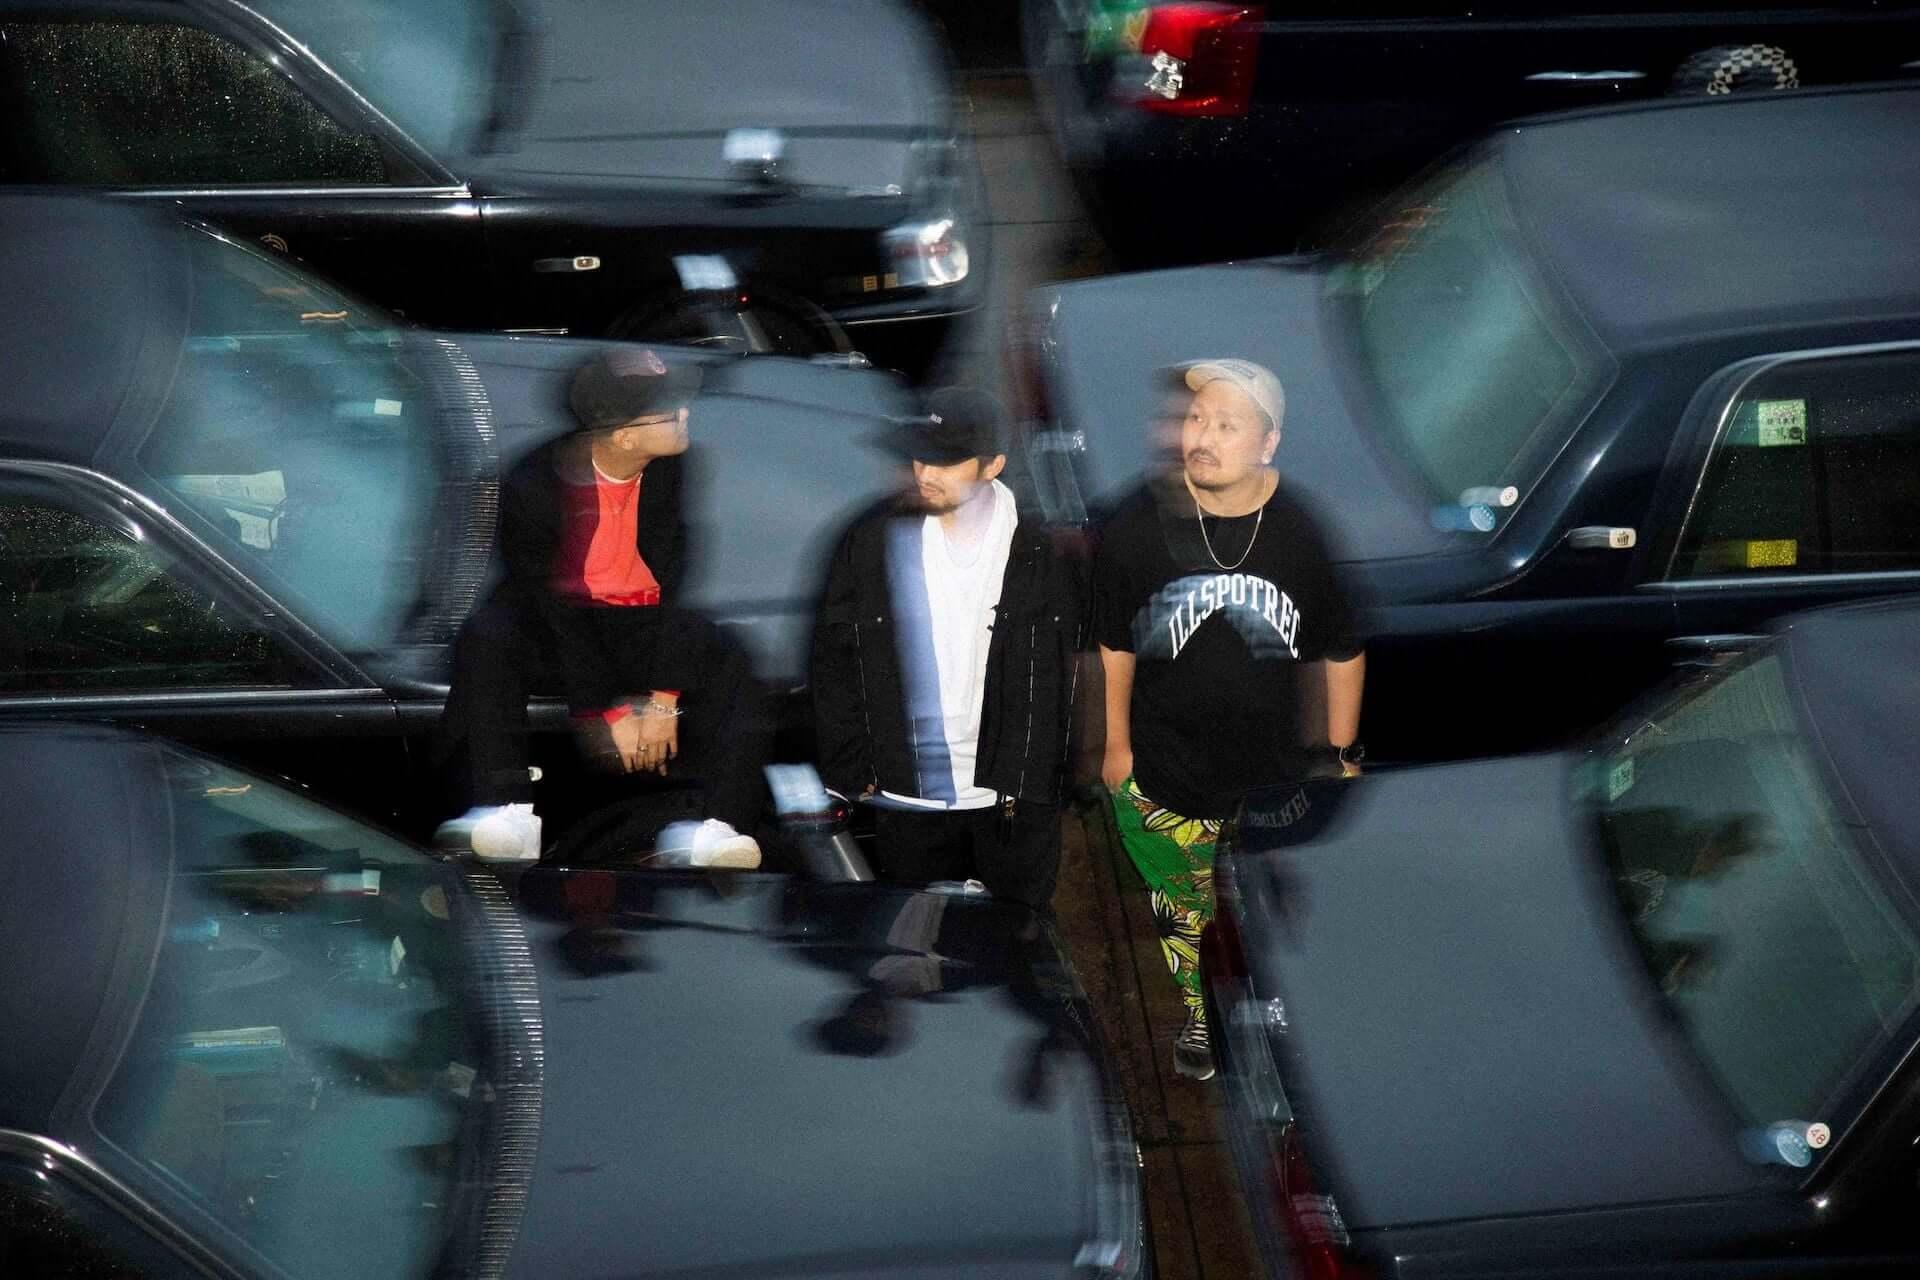 "BLABLA、Vue dumonde、m-alによるユニット・PACK3がデビューアルバム『PACKQAGE』のCDを本日発売!OMSB参加の楽曲""Discovery""MVも公開 music201216_pack3_2-1920x1280"